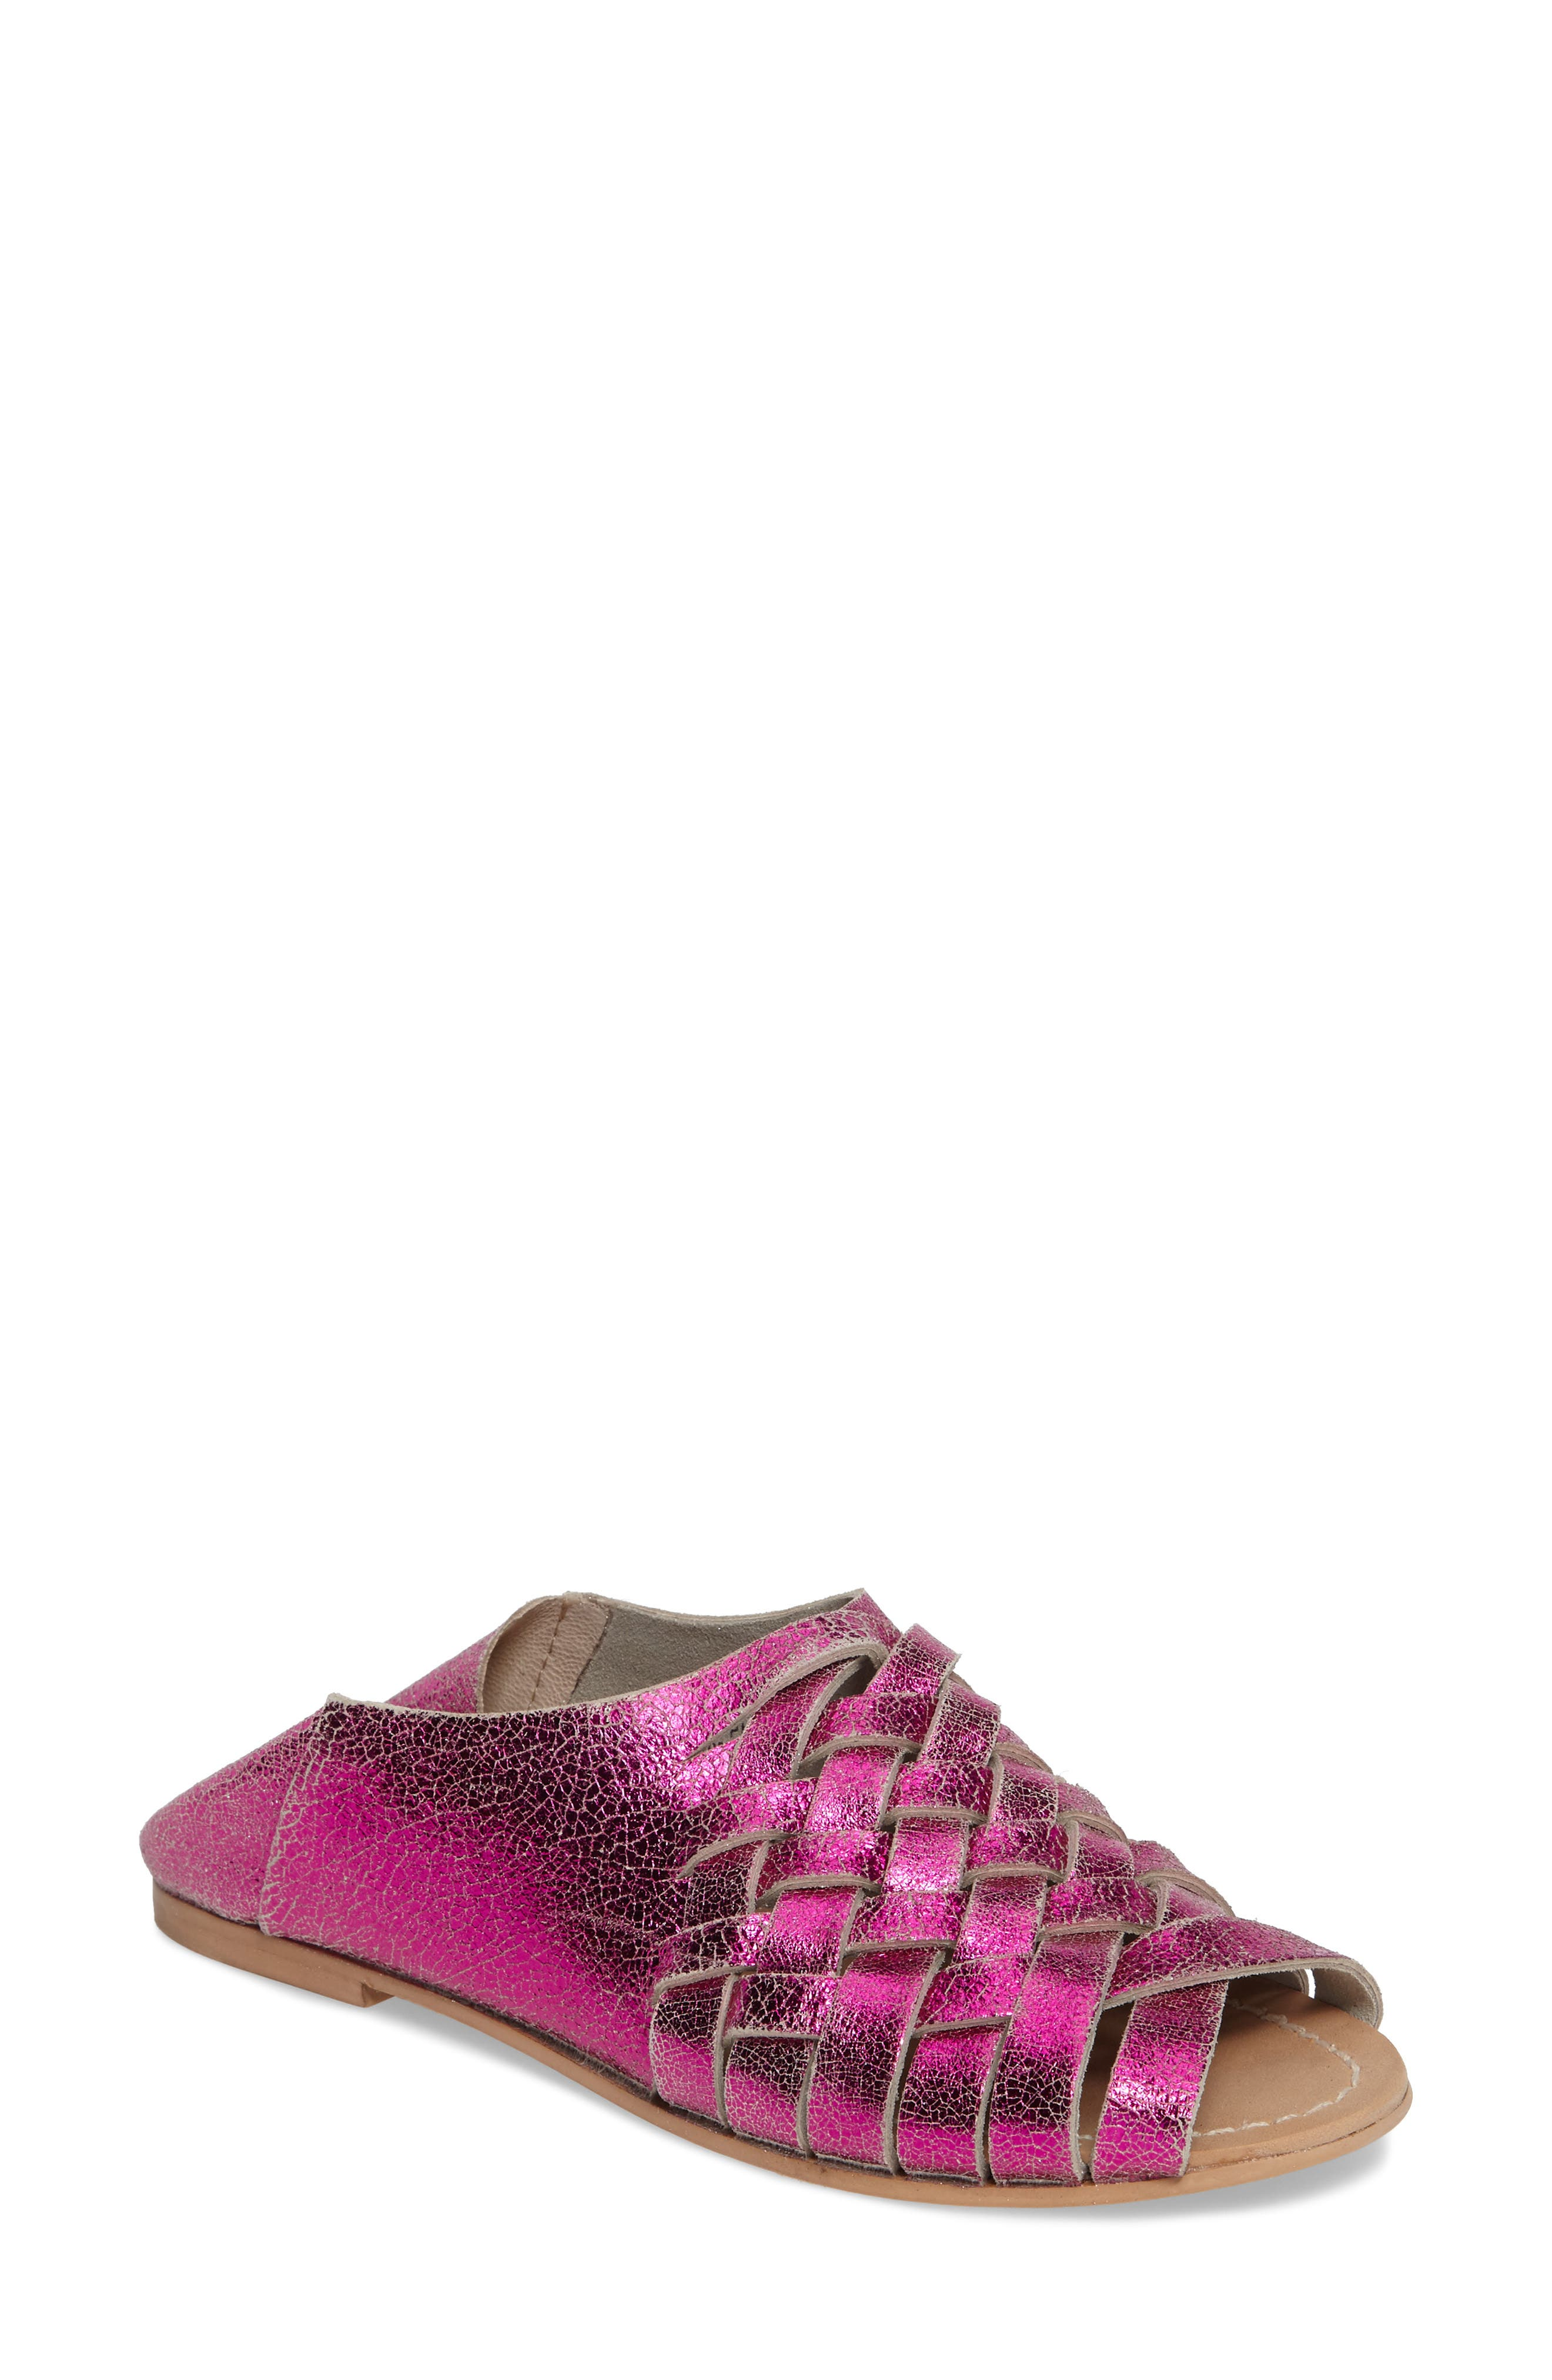 Topshop Florida Convertible Woven Sandal (Women)